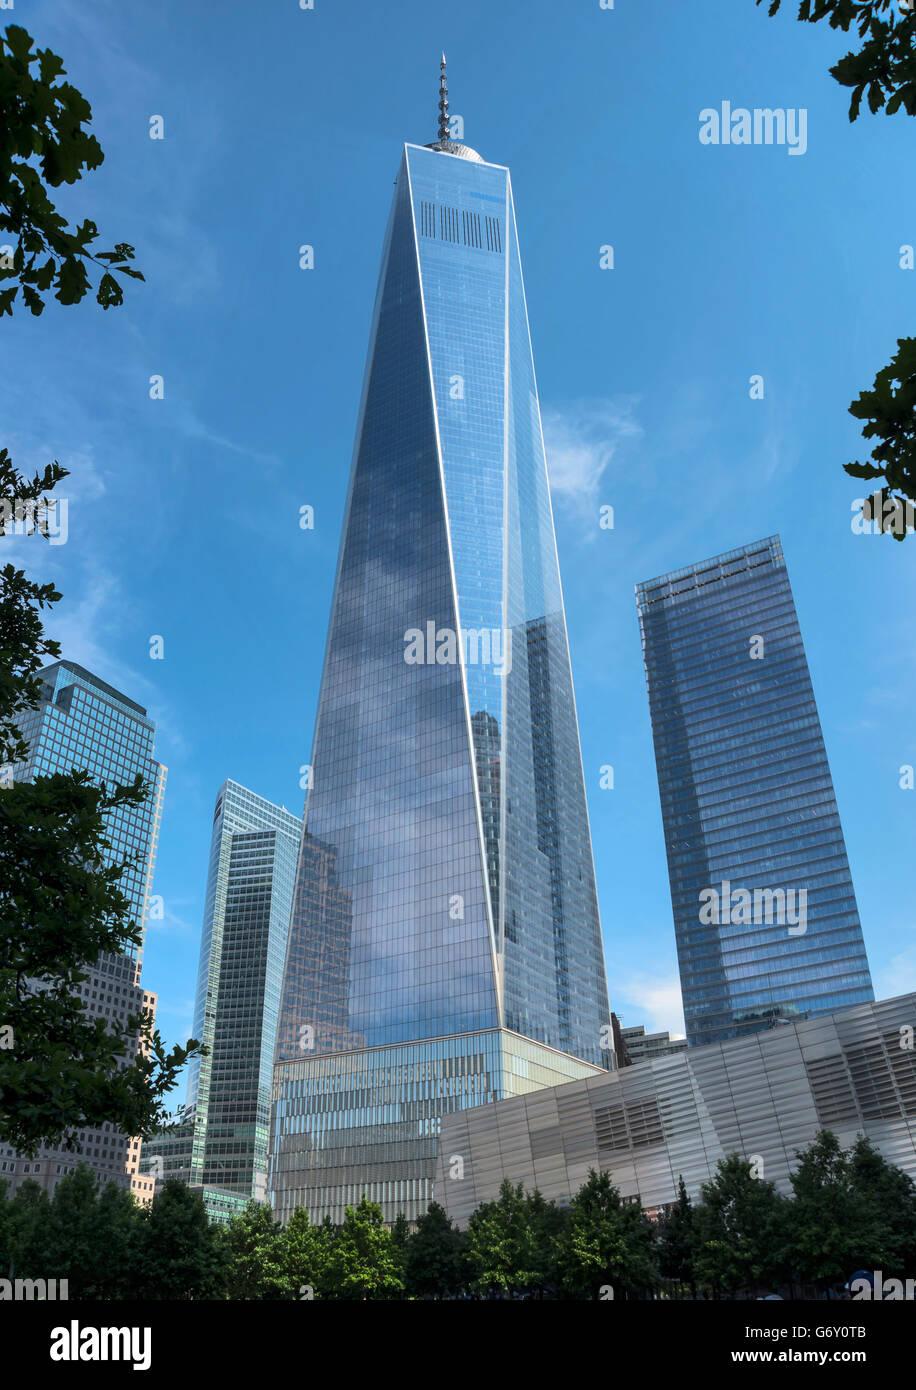 Blick auf One World Trade Center, New York, New York State, Lower Manhattan, USA Stockbild